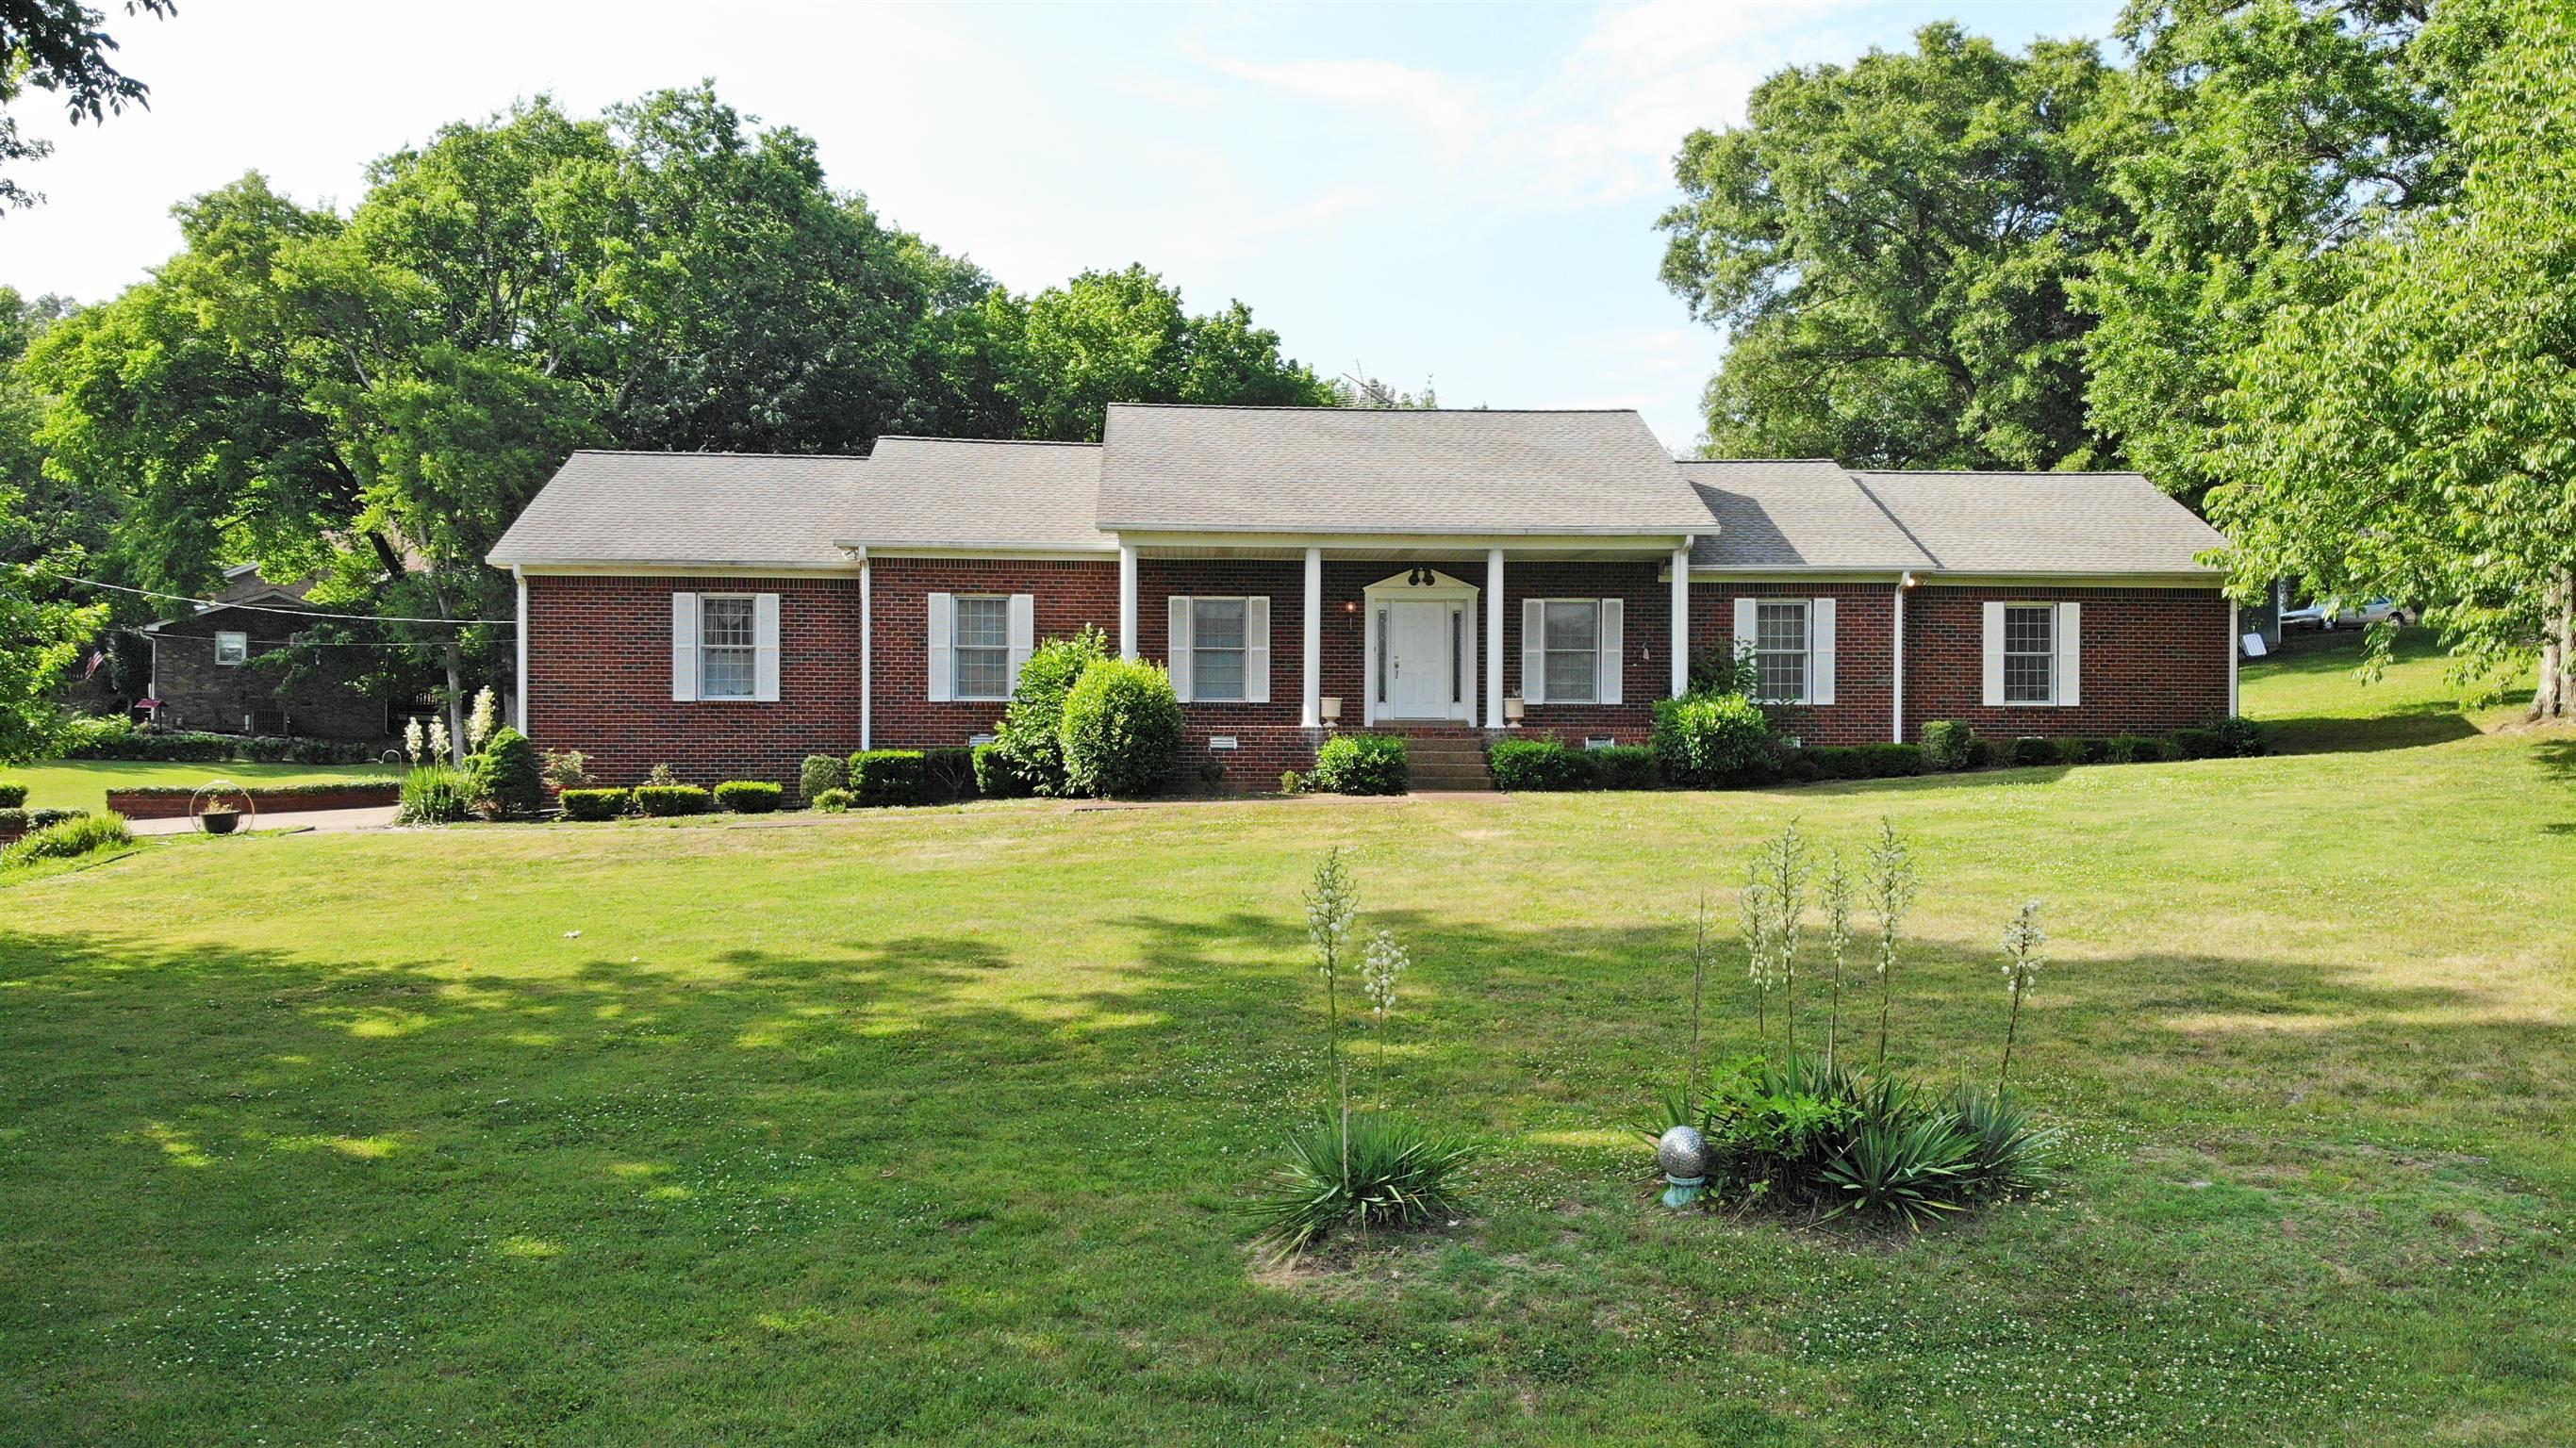 301 Mathes Dr, Goodlettsville, TN 37072 - Goodlettsville, TN real estate listing